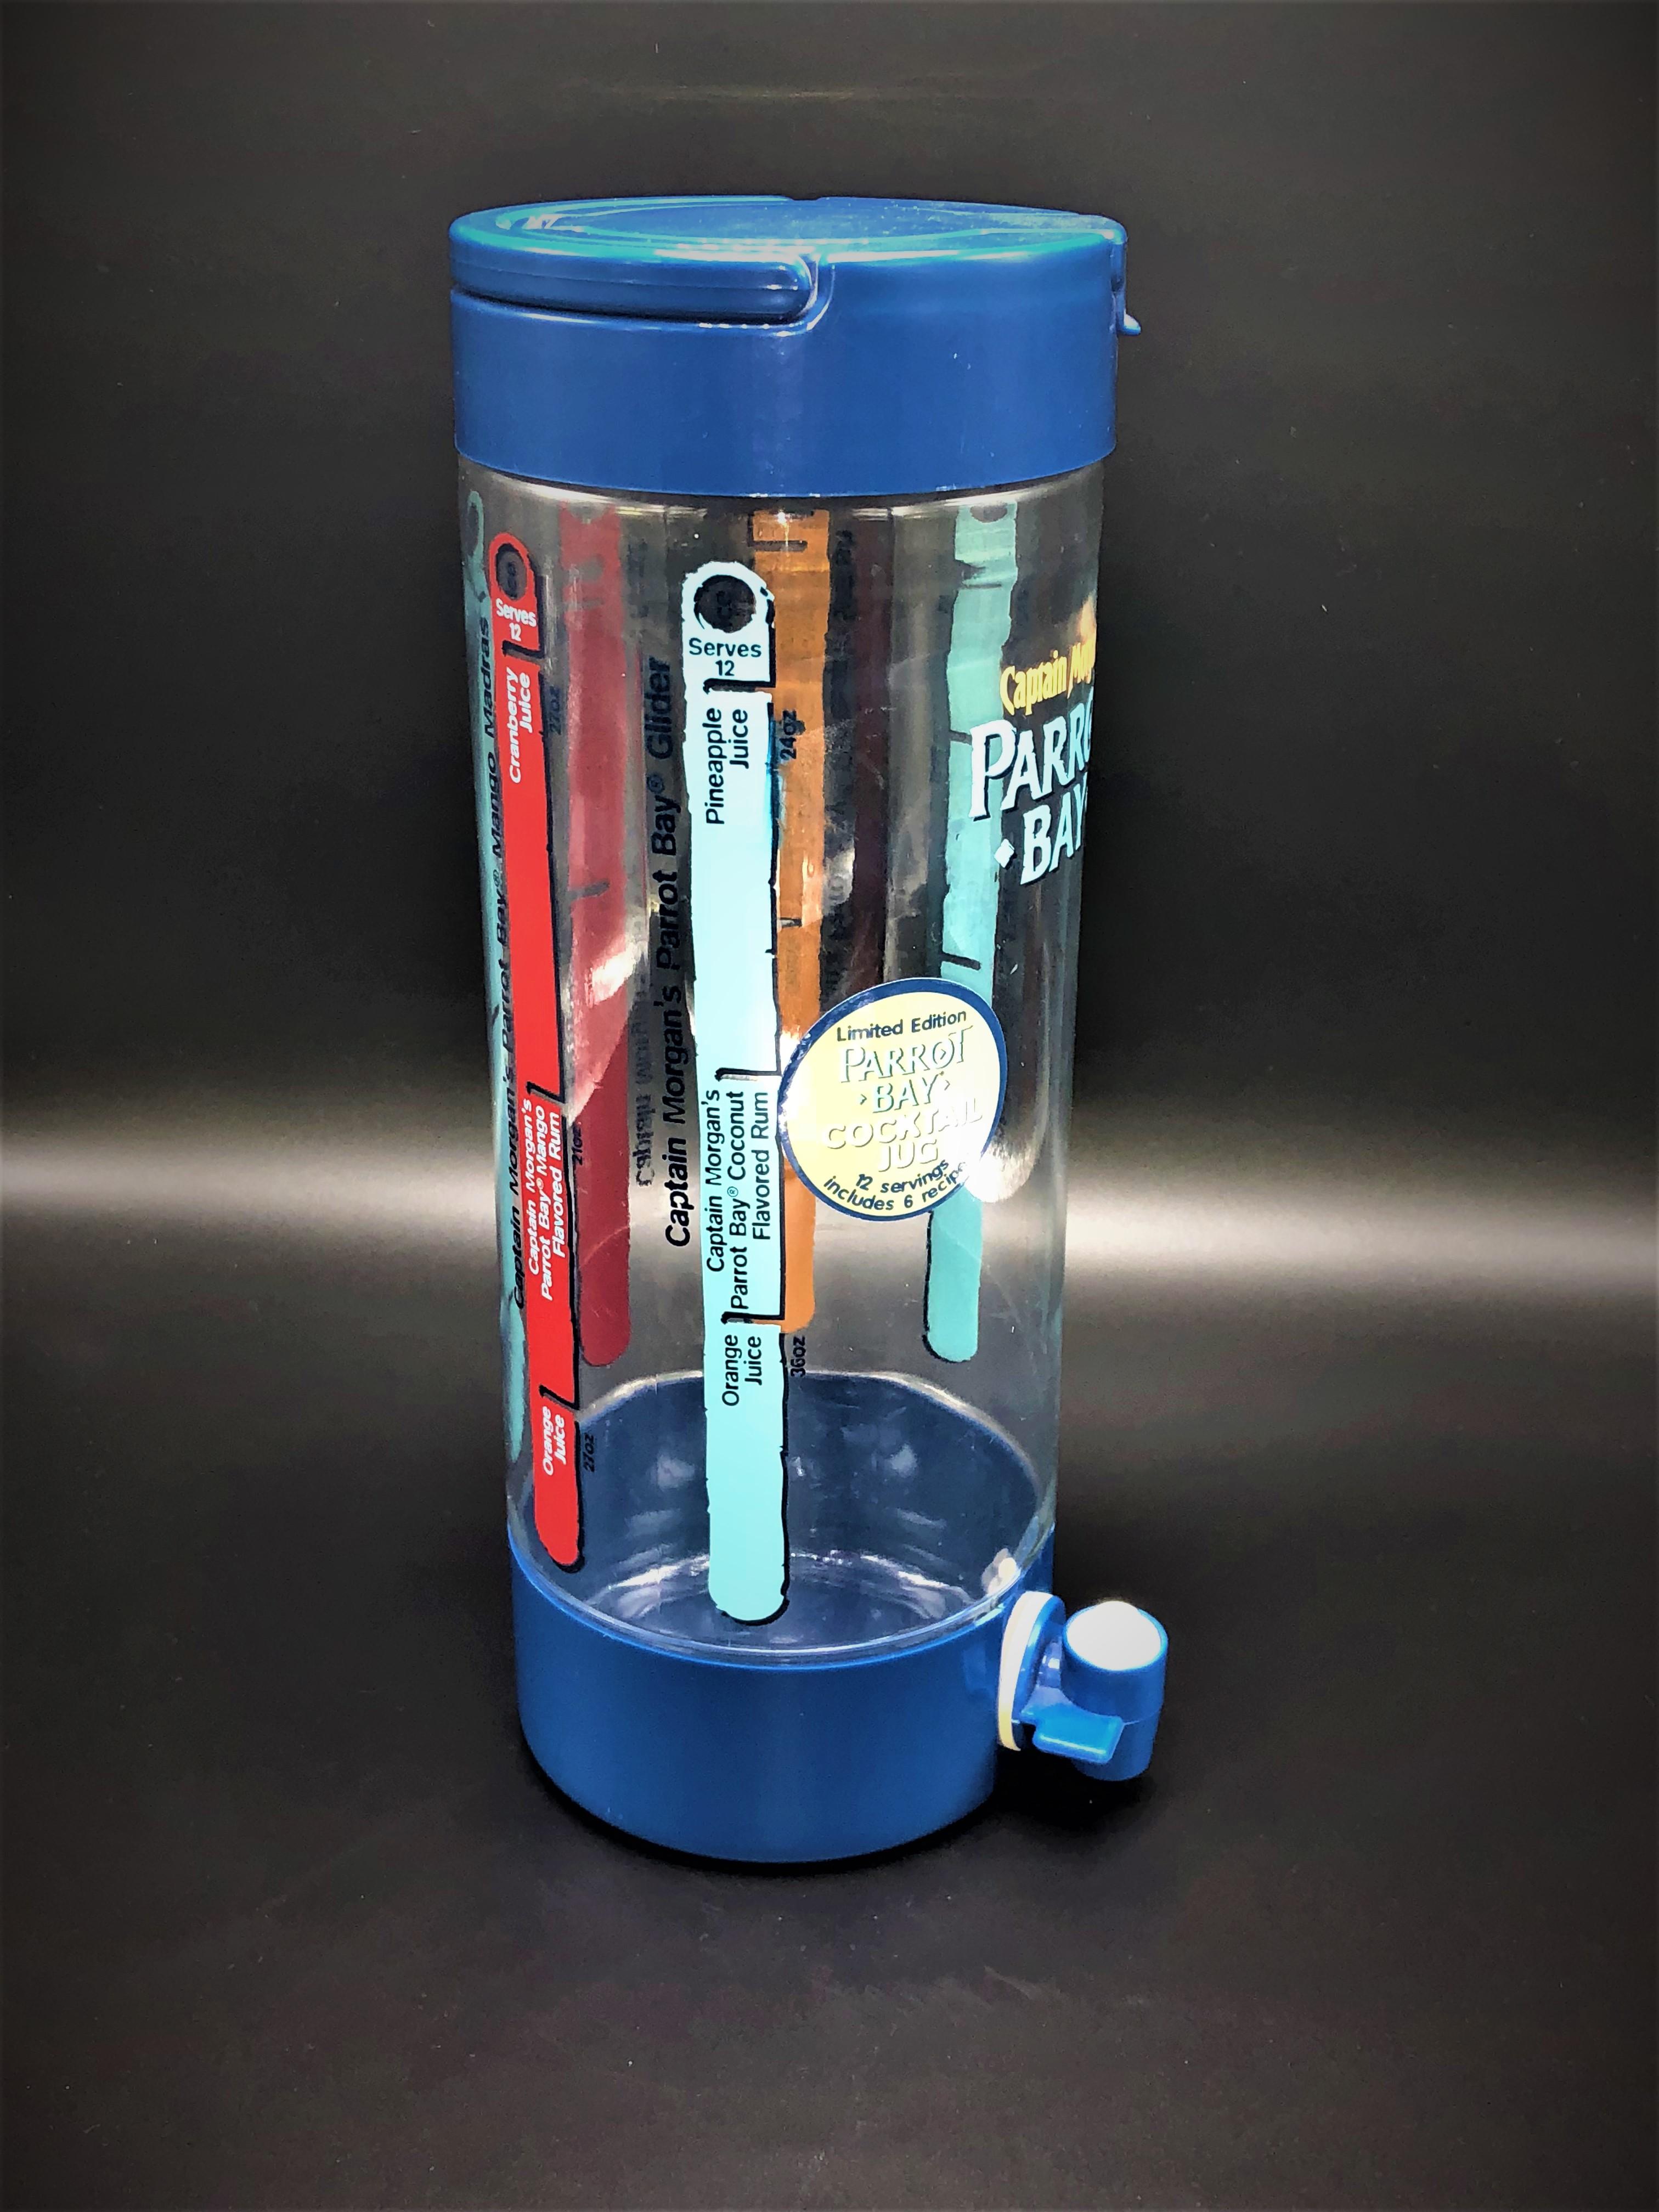 Drink Dispenser (Cpt Morgan-Parrot Bay)-